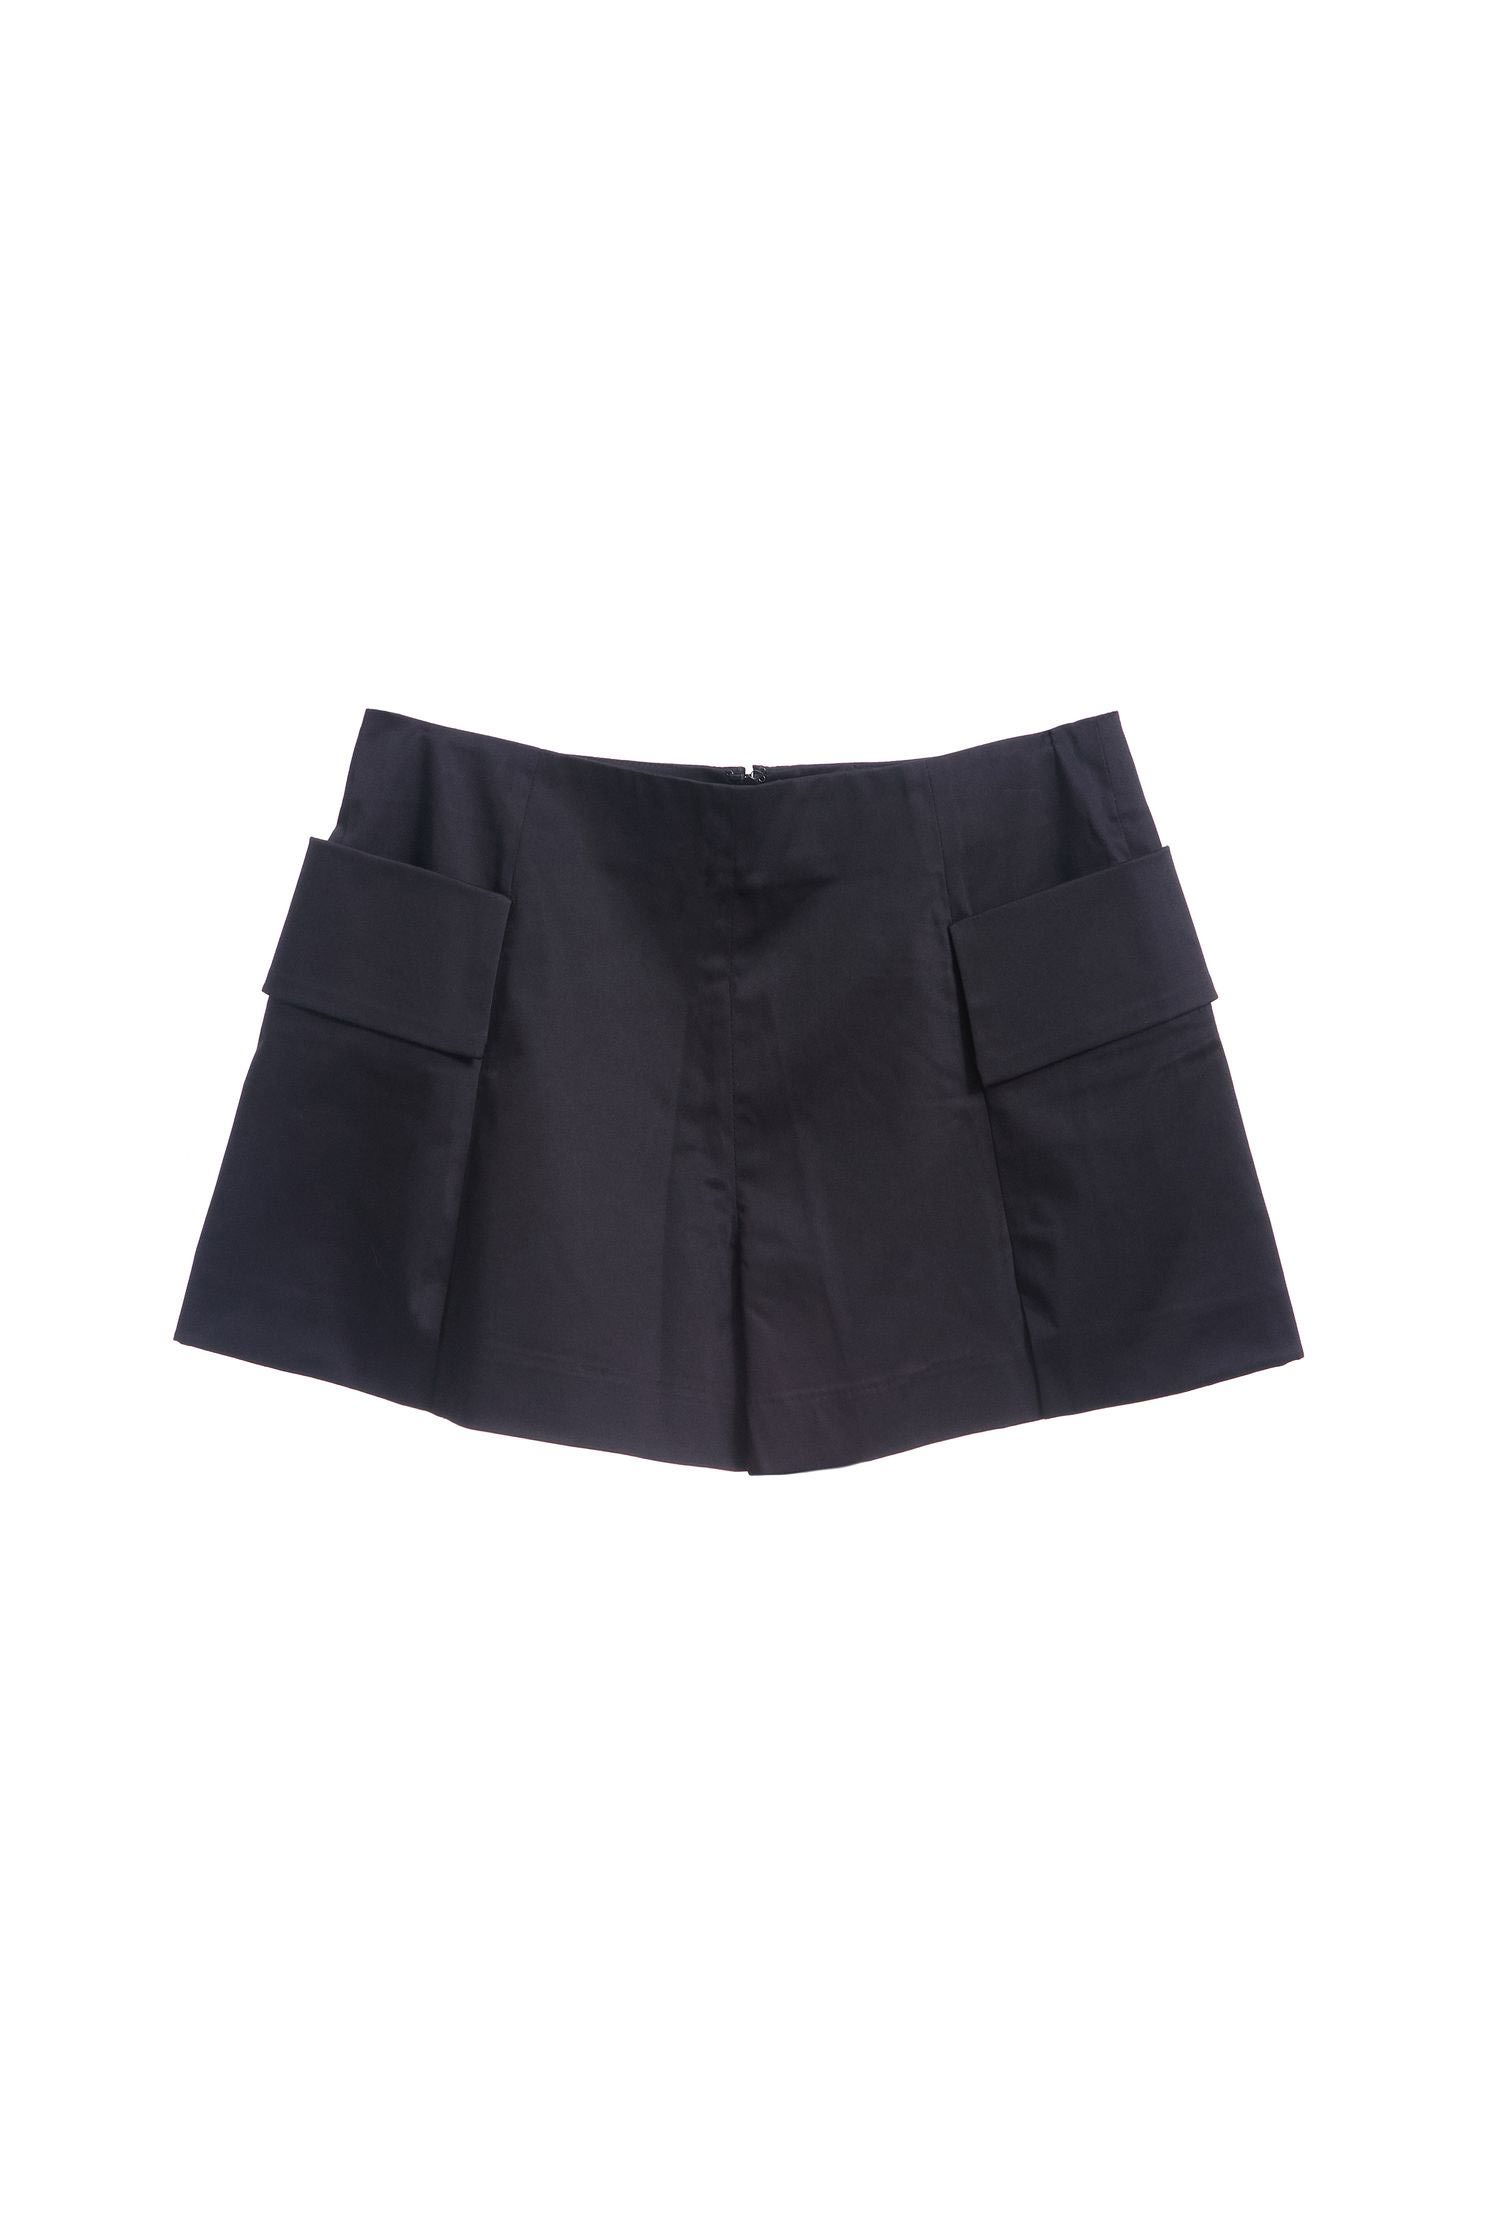 Double pocket classic design shorts